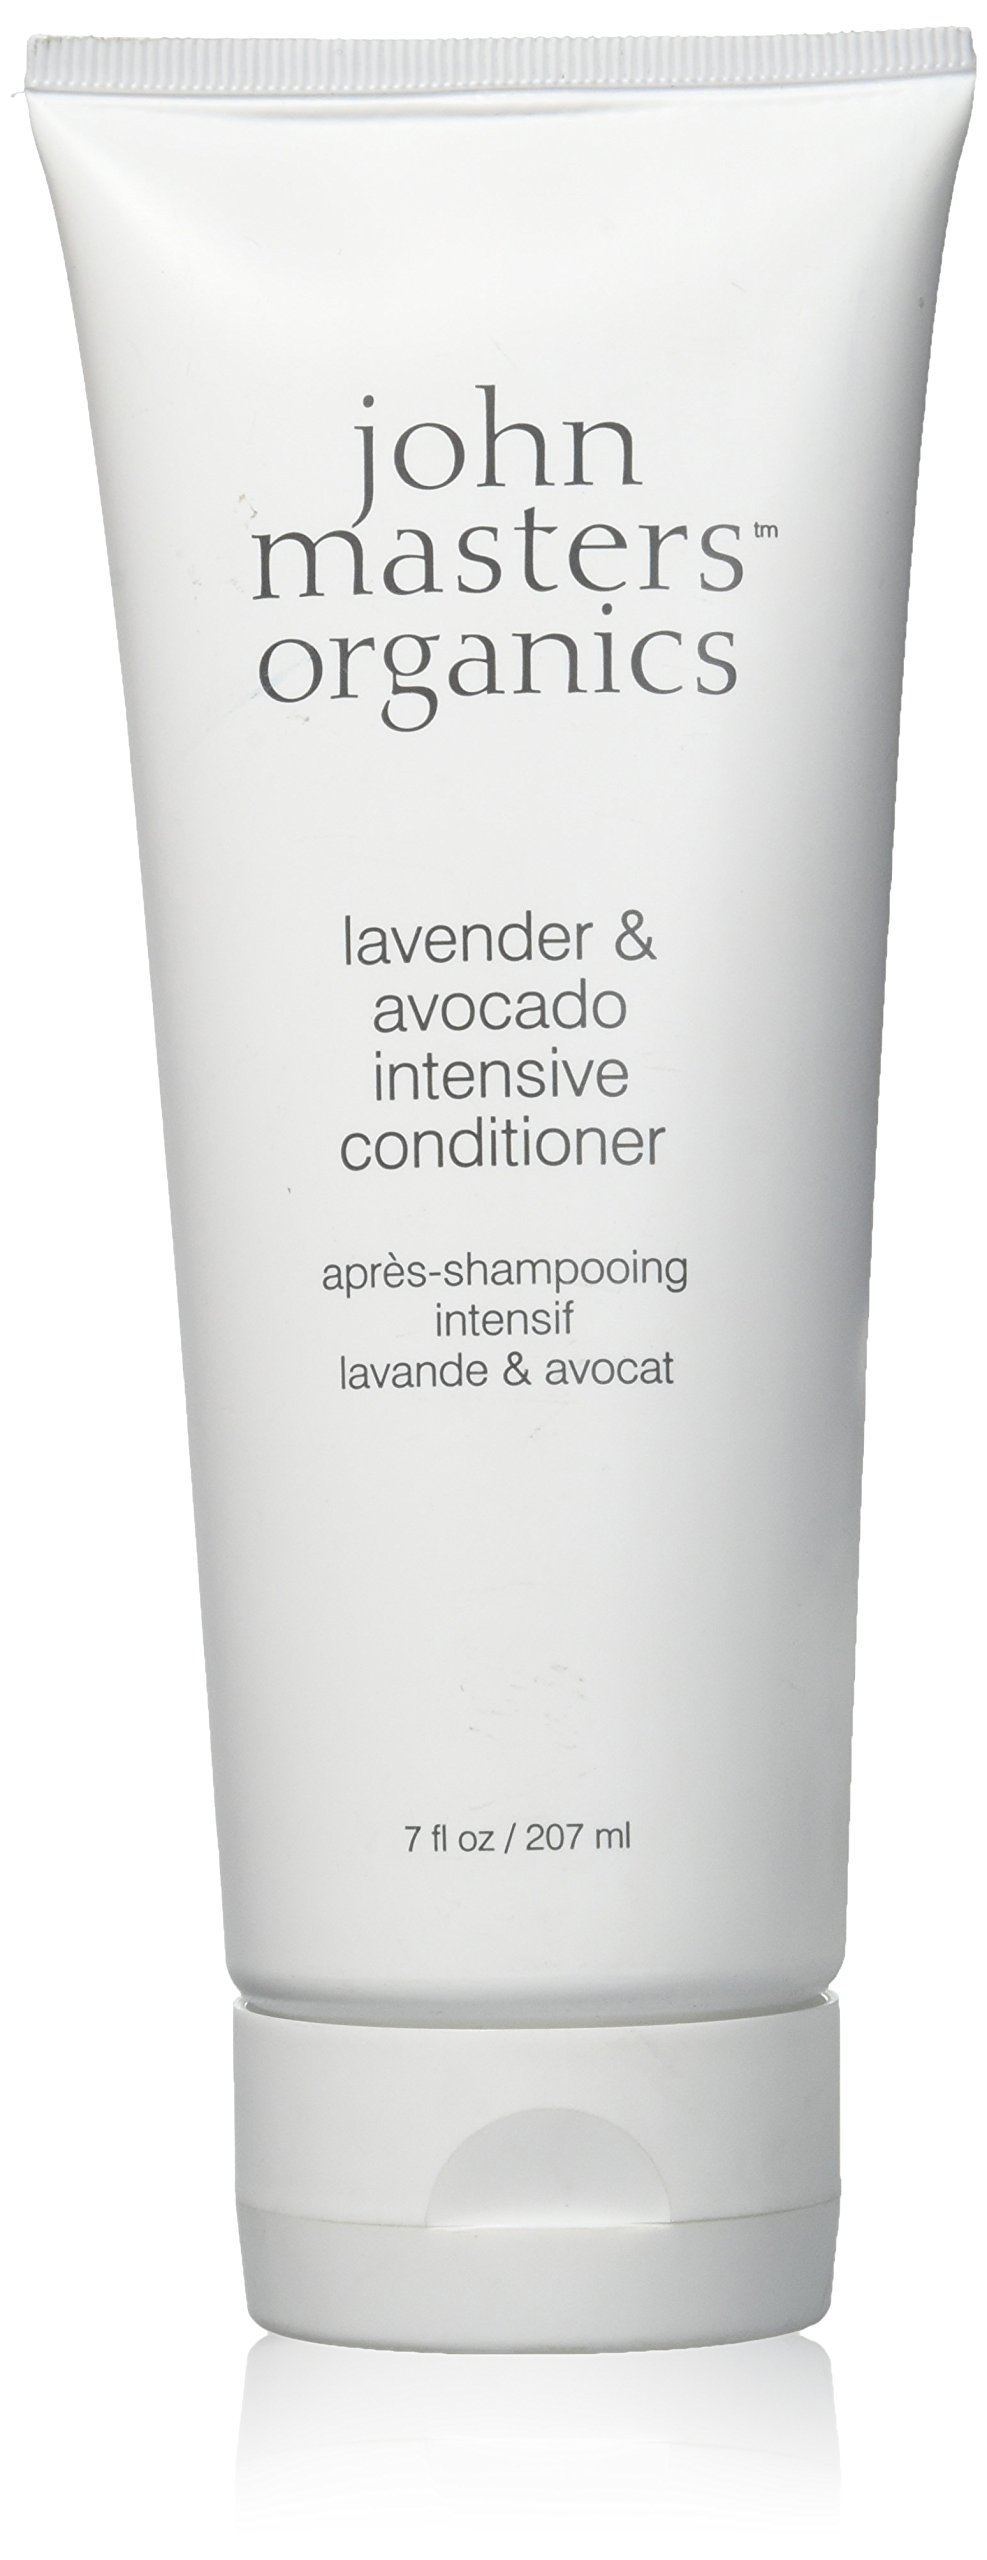 John Masters Organics Lavender & Avocado Intensive Conditioner 207ml/7oz